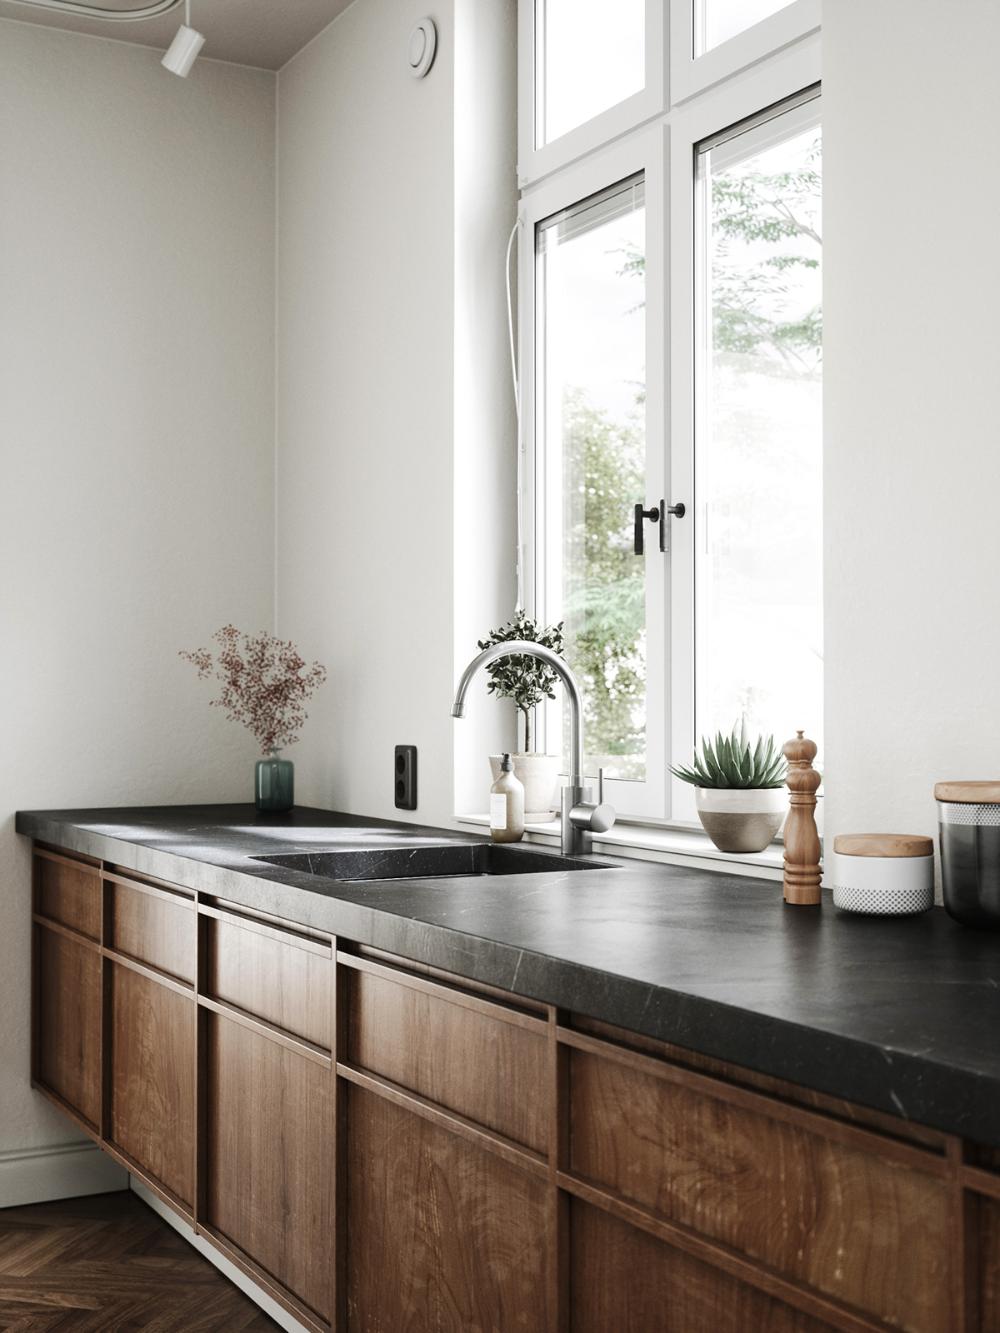 Kitchen set CGI on Behance